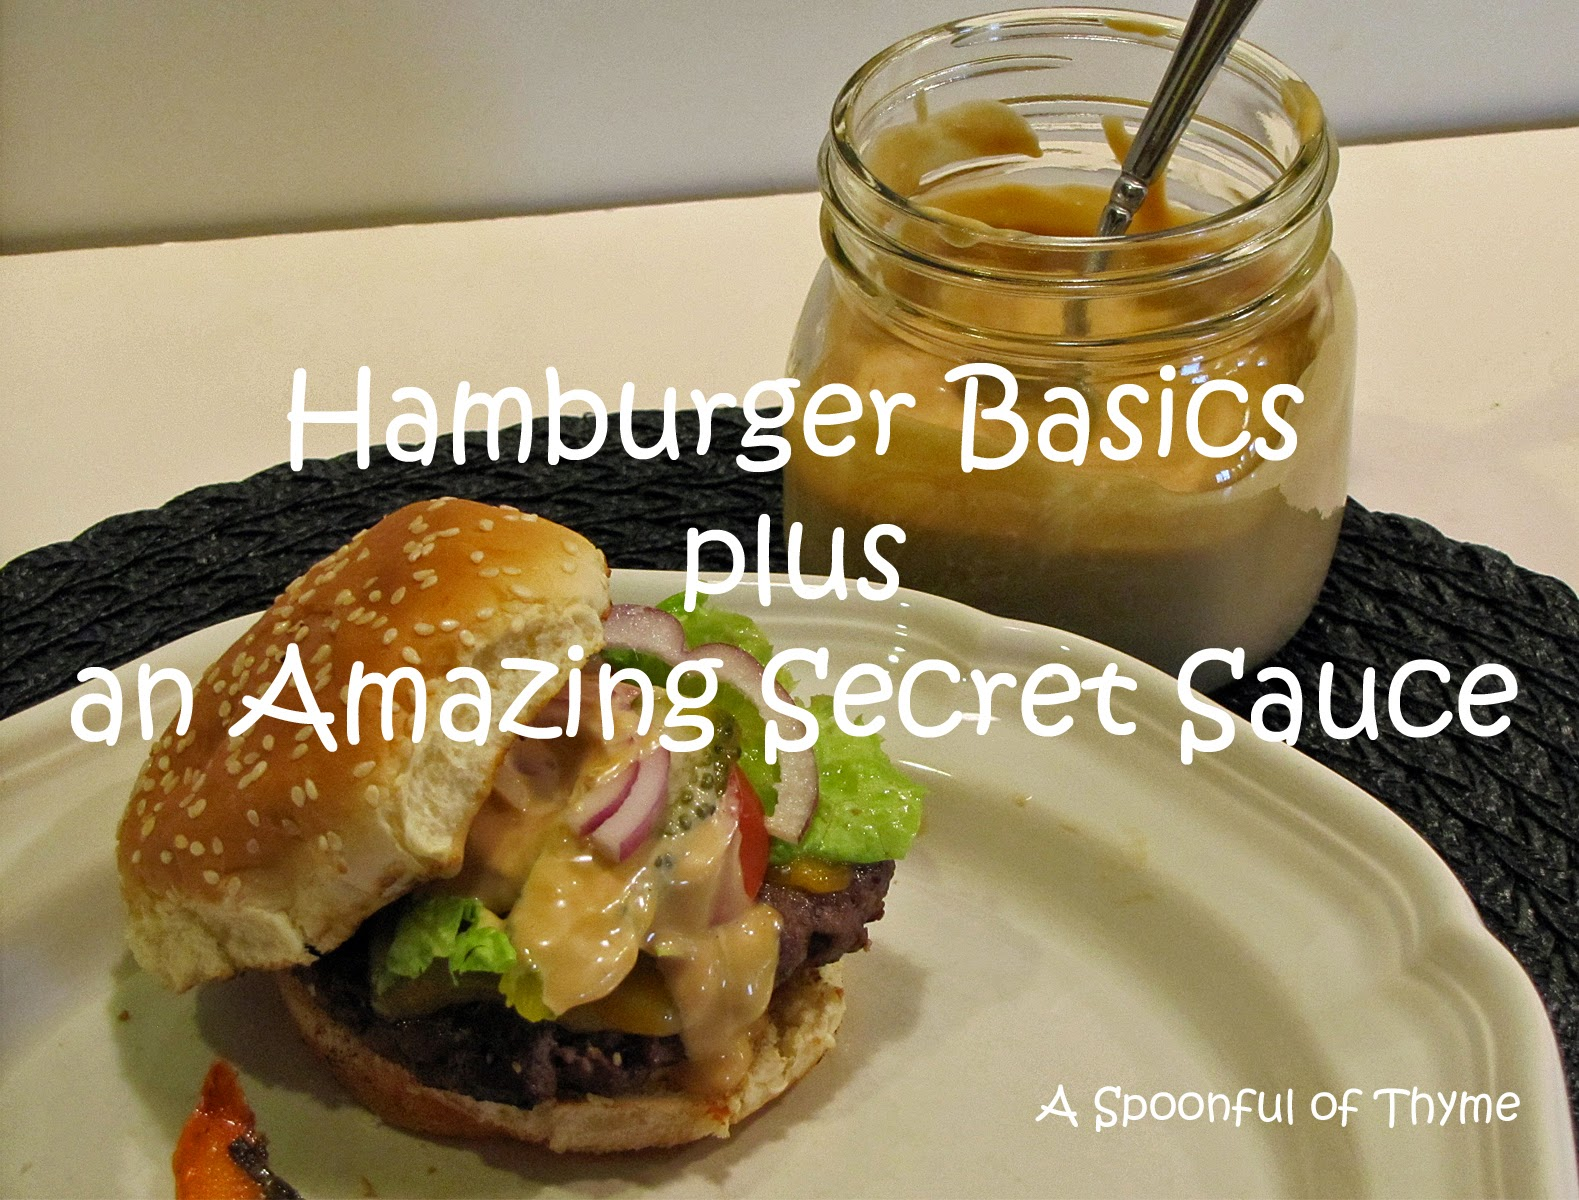 hamburger basics plus an amazing secret sauce!